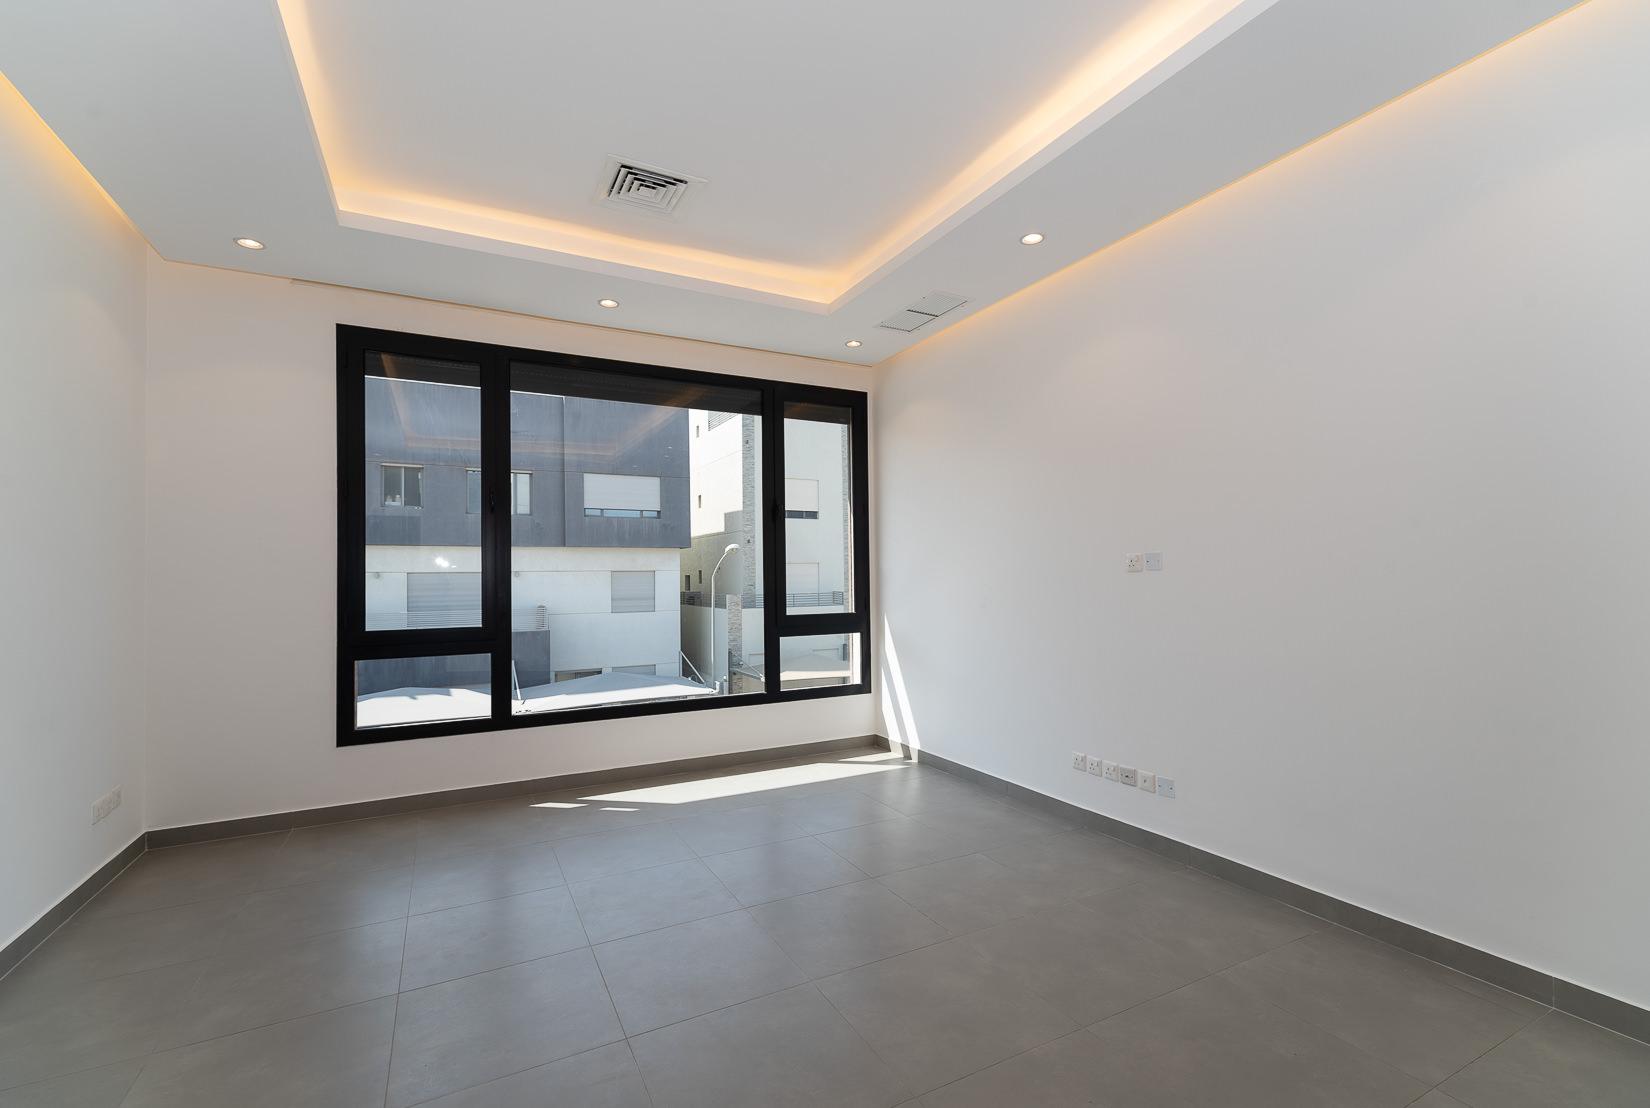 Sunny apartments in Fnaitees, Kuwait